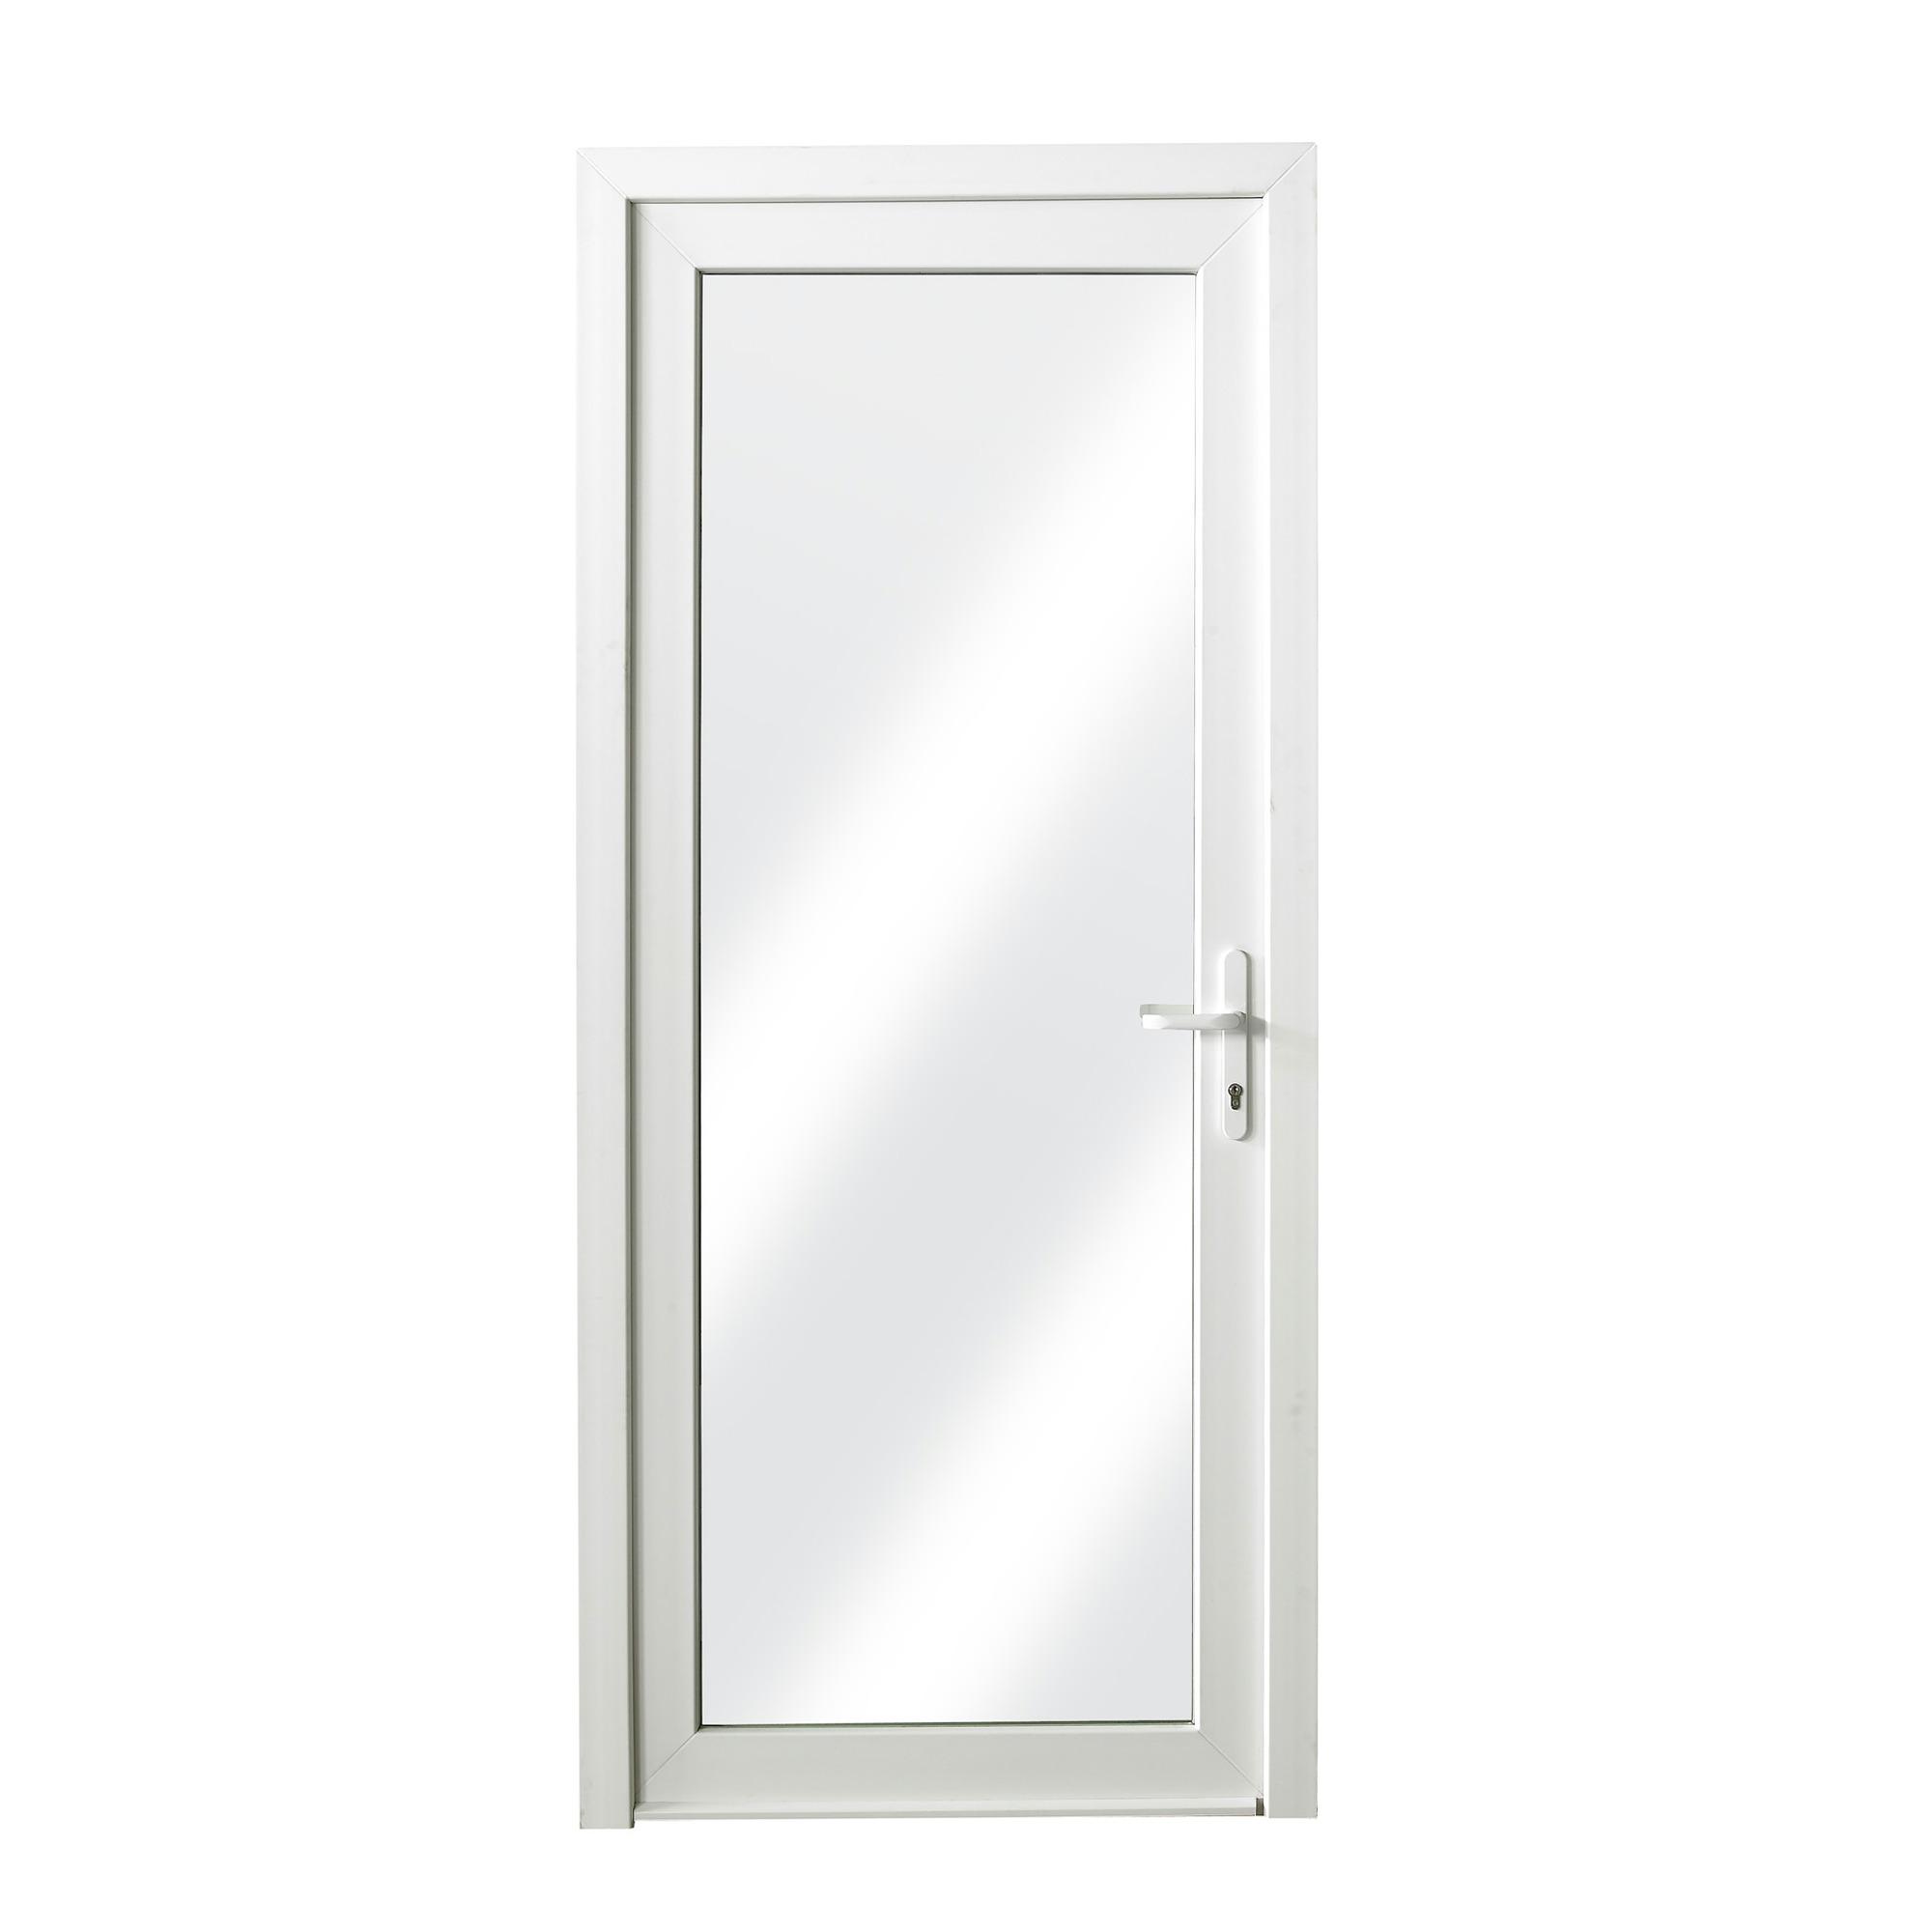 porte ext rieure en pvc vitr e droite 218x96 cm blanc u 1